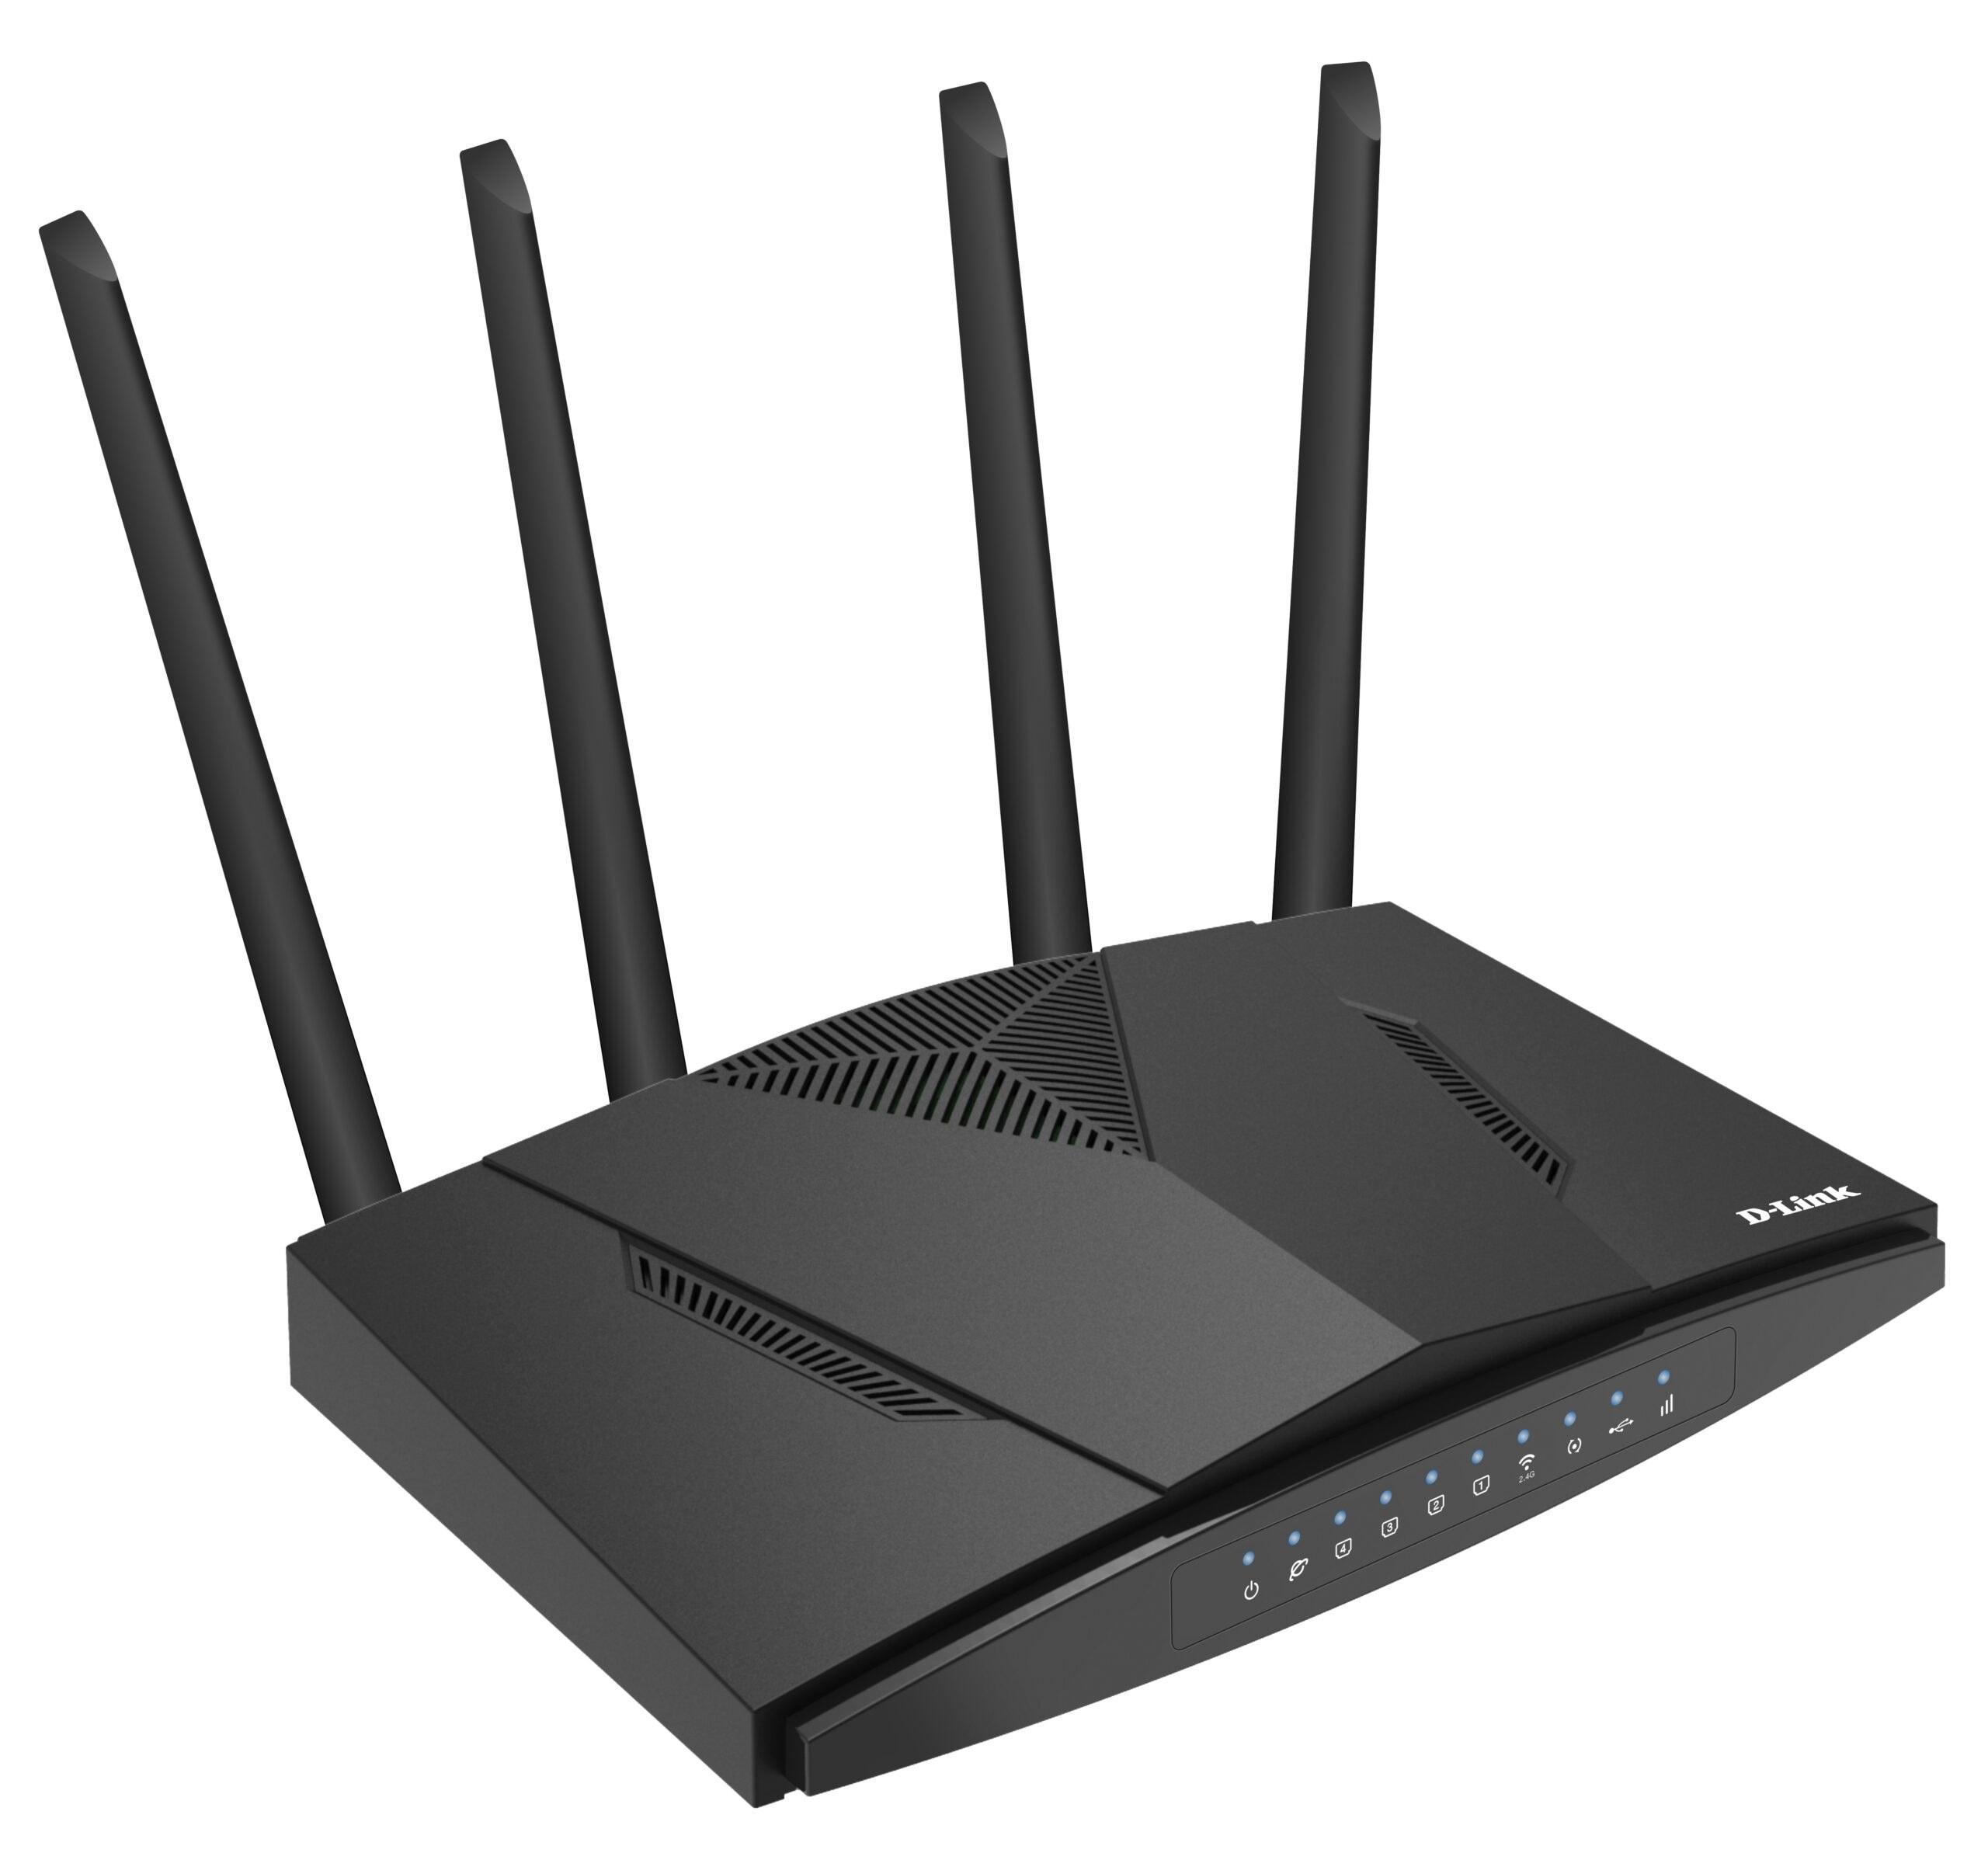 تصویر مودم 3G/4G/LTE شرکت D-LINK مدل DWR-921